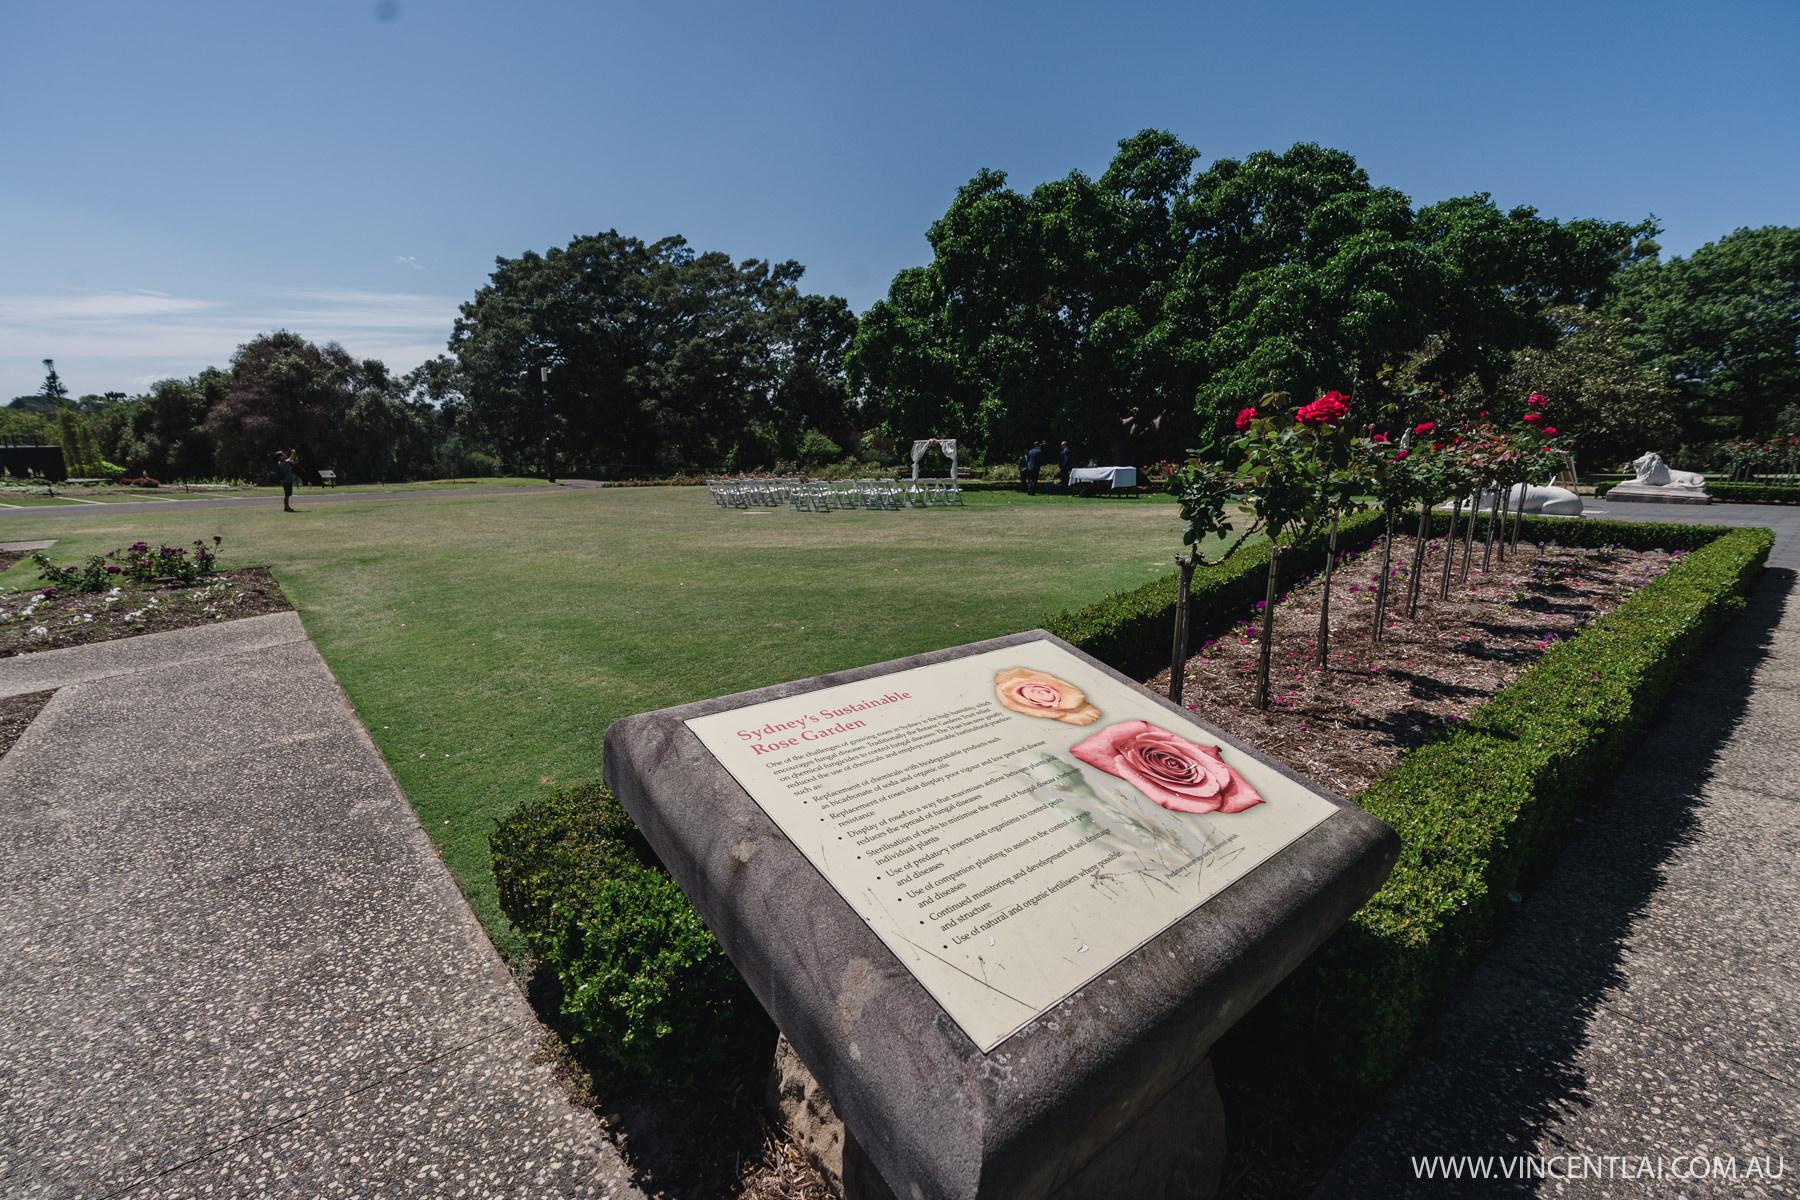 RoyalBotanicGarden'sRose Garden Pavilion and Lawn